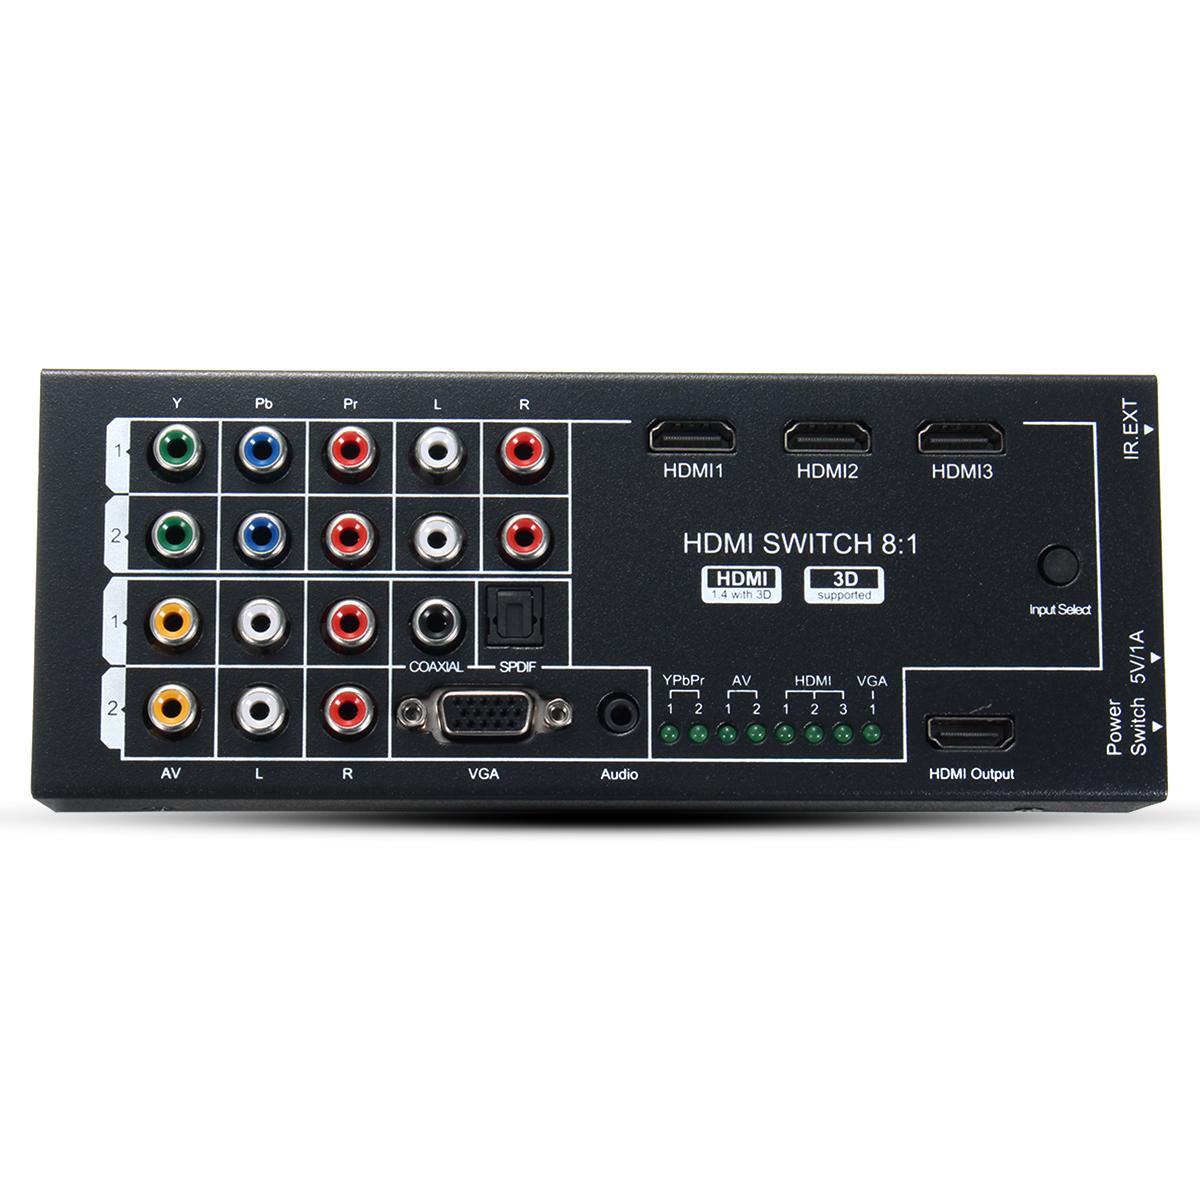 Digital Multifunction Video Audio Adapter HD Converter 8 Inputs to 1 HD